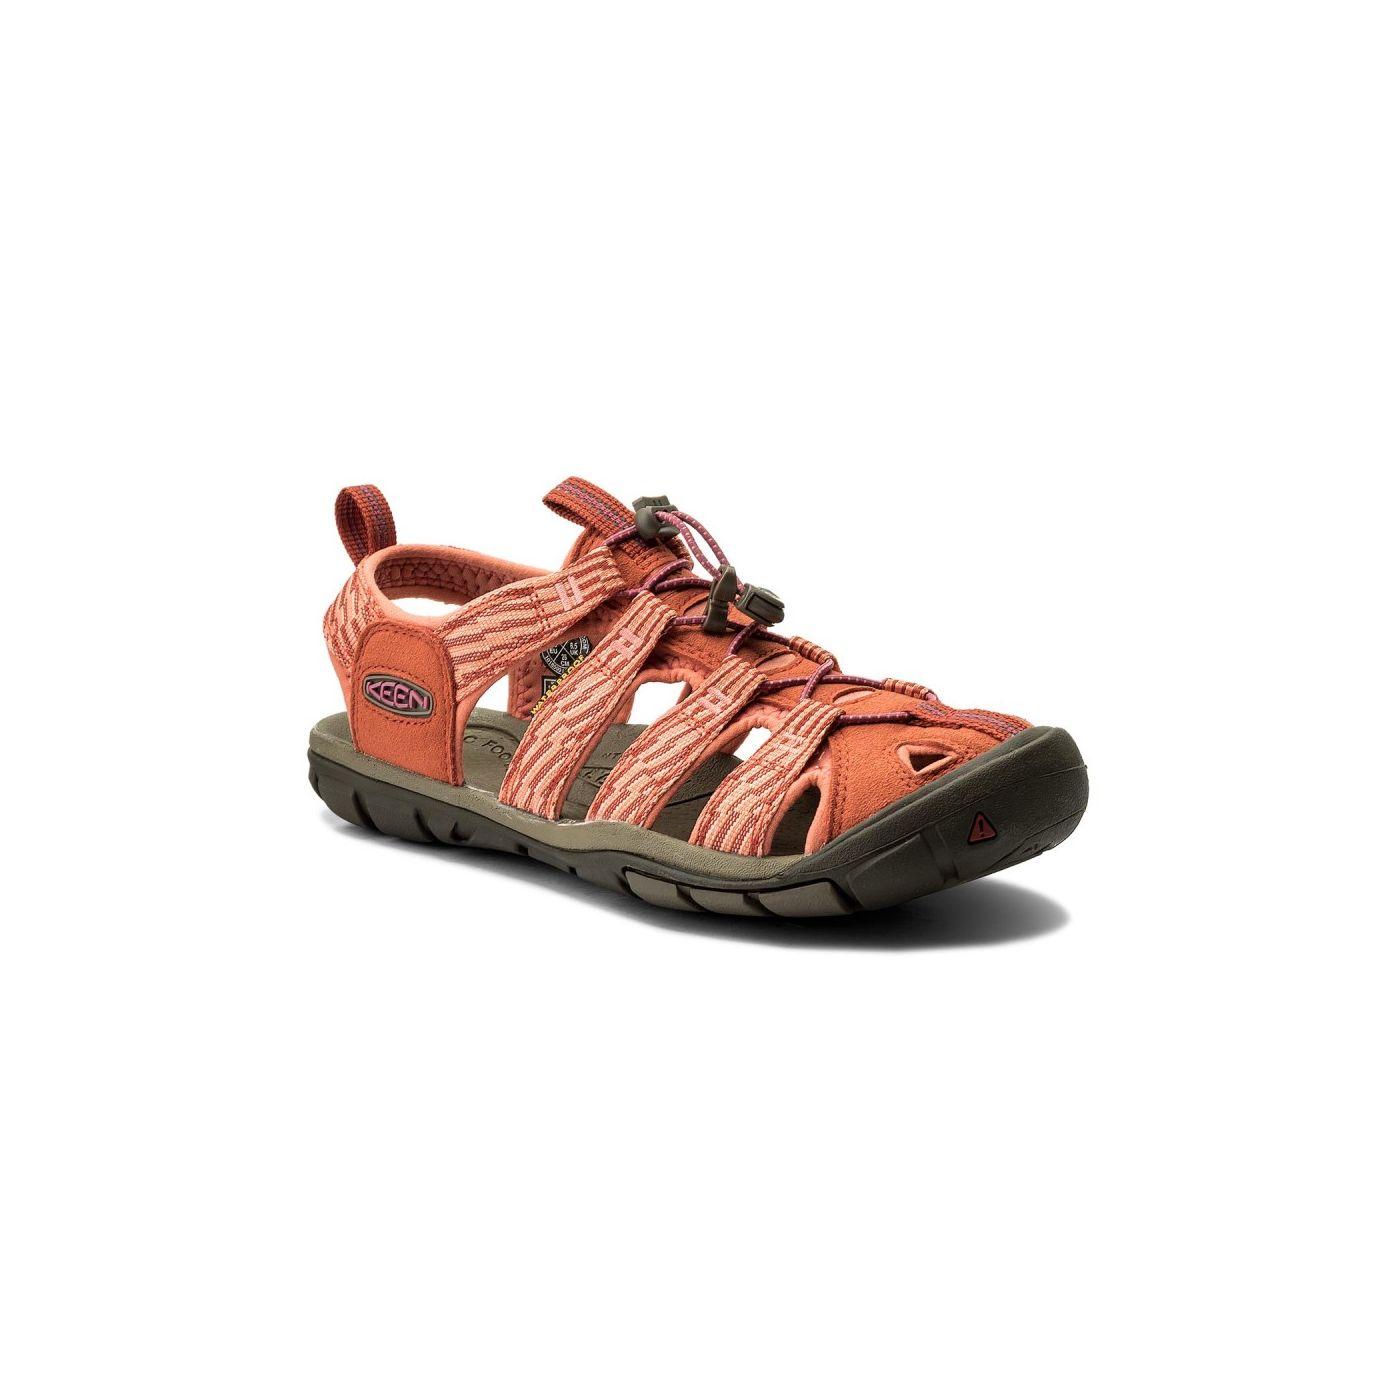 Women's outdoor sandals KEEN Clearwater CNX W